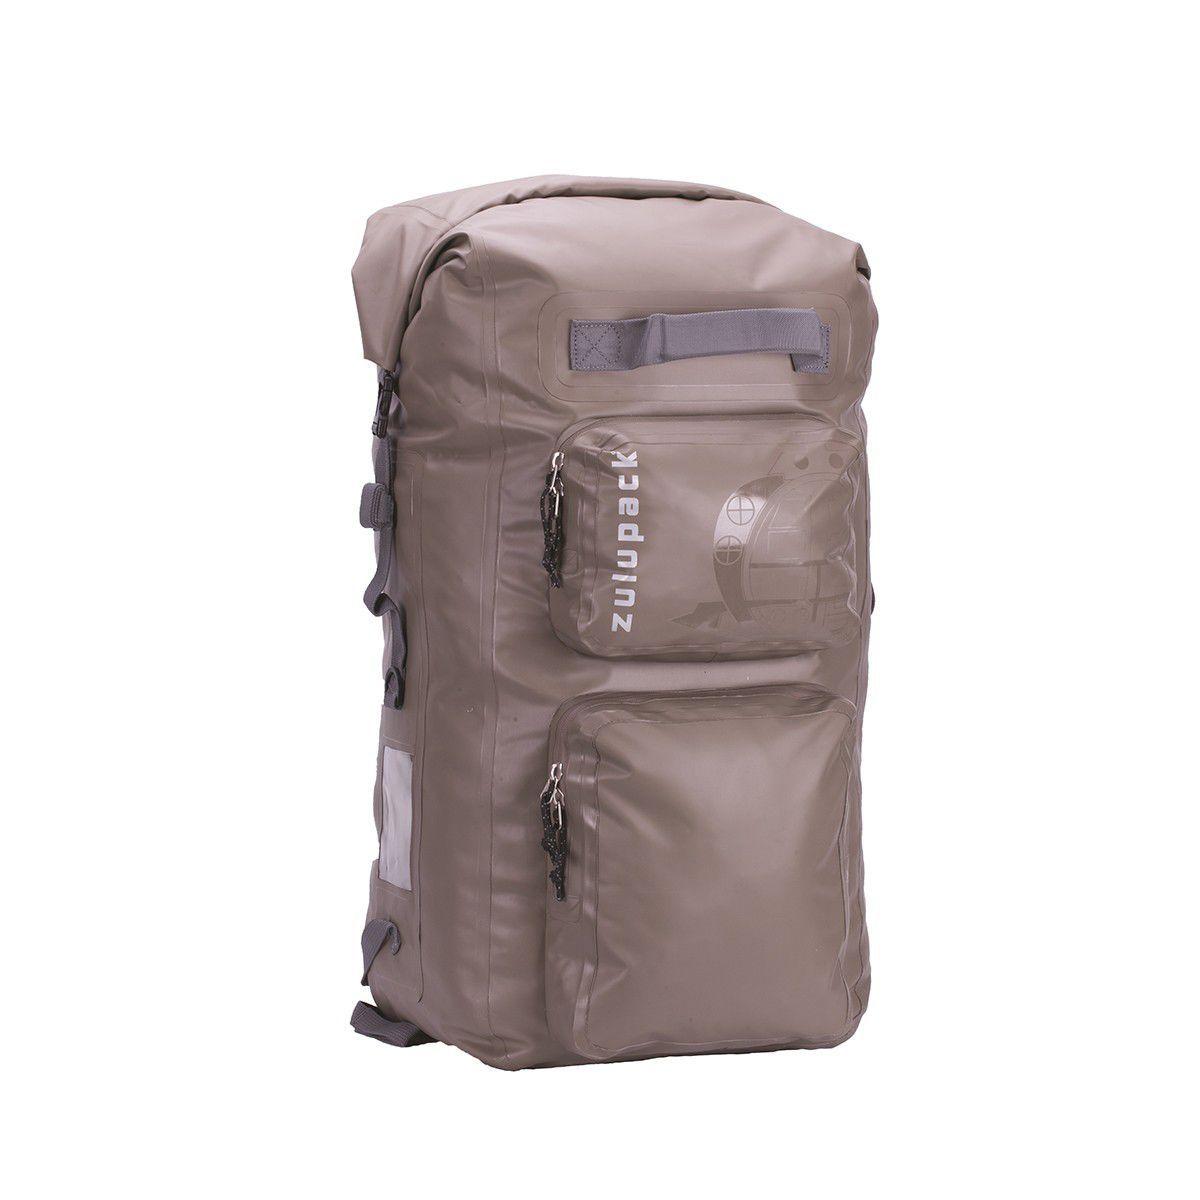 caracteristicas mochila nomad backpack